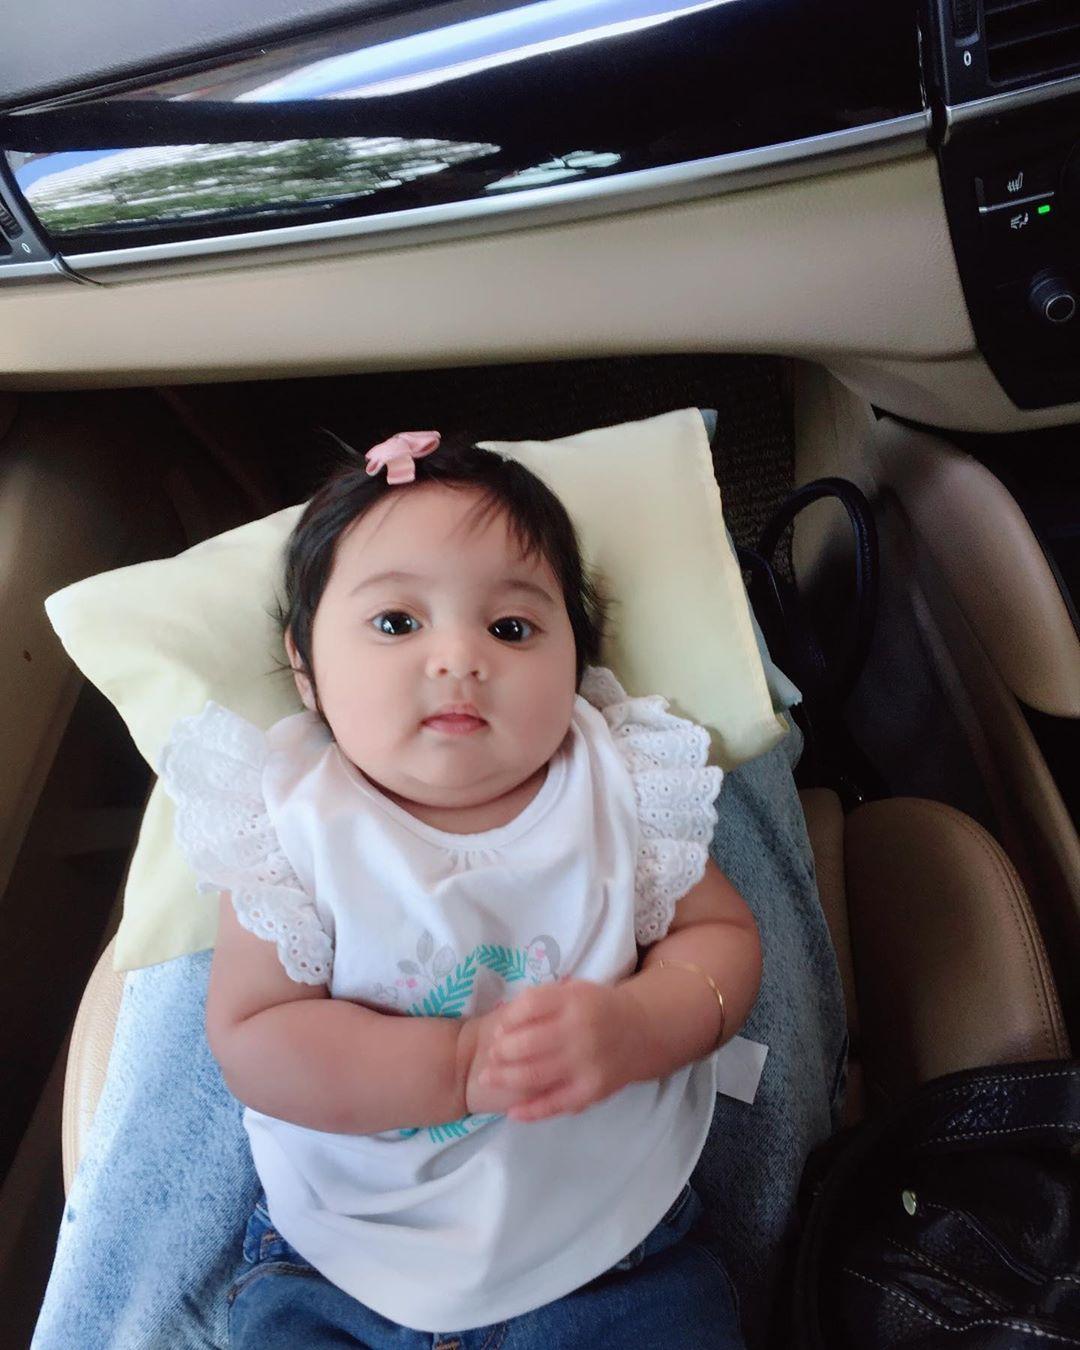 [FOTO] Pejam Celik Dah 3 Bulan, Kecomelan Baby Azura Buat Netizen Geram